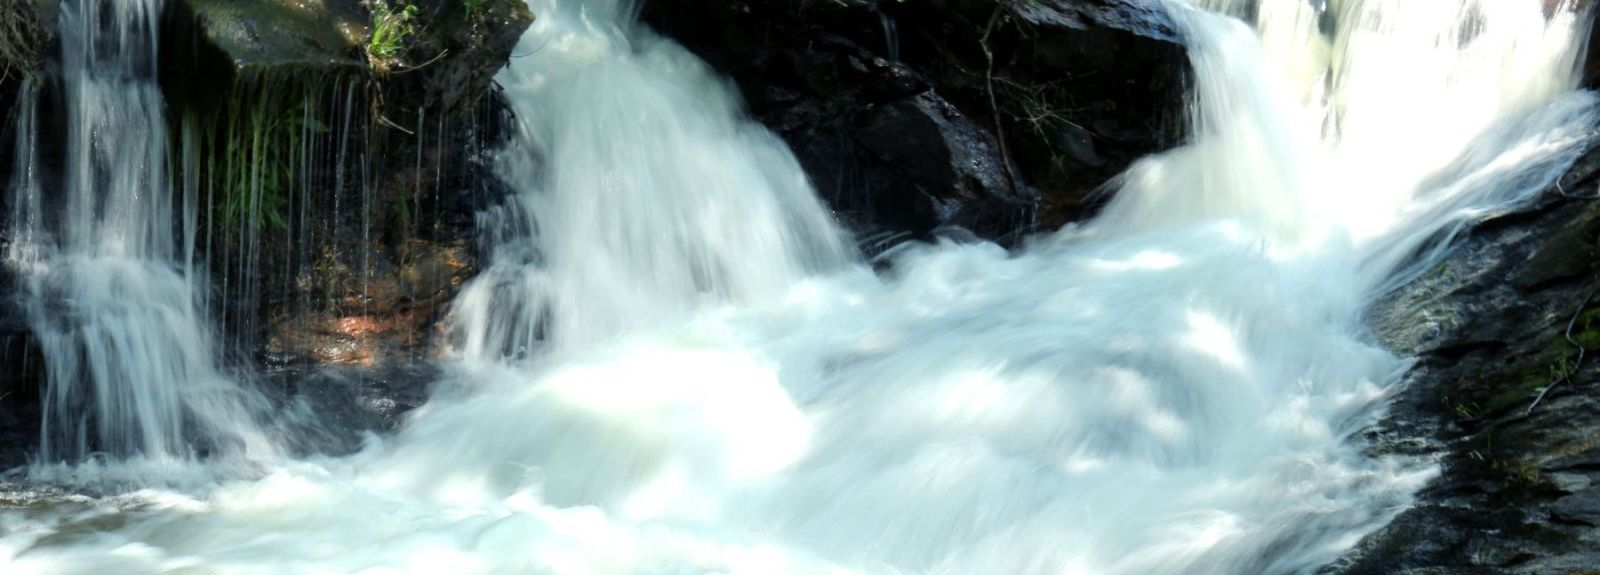 Amicalola Falls State Park, Dawsonville, GA, USA